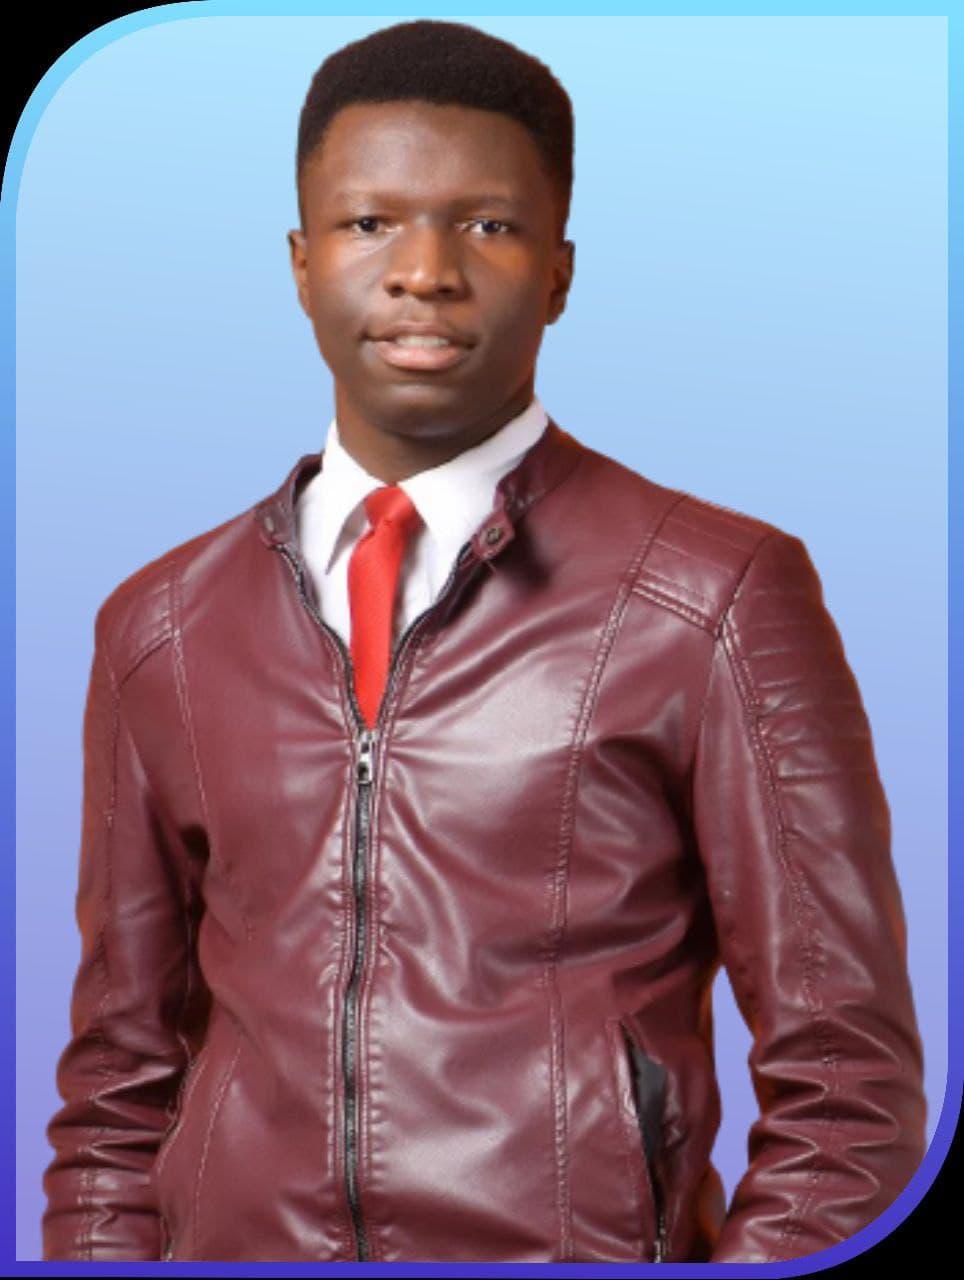 Ikechukwu Kelvin Dikeojo